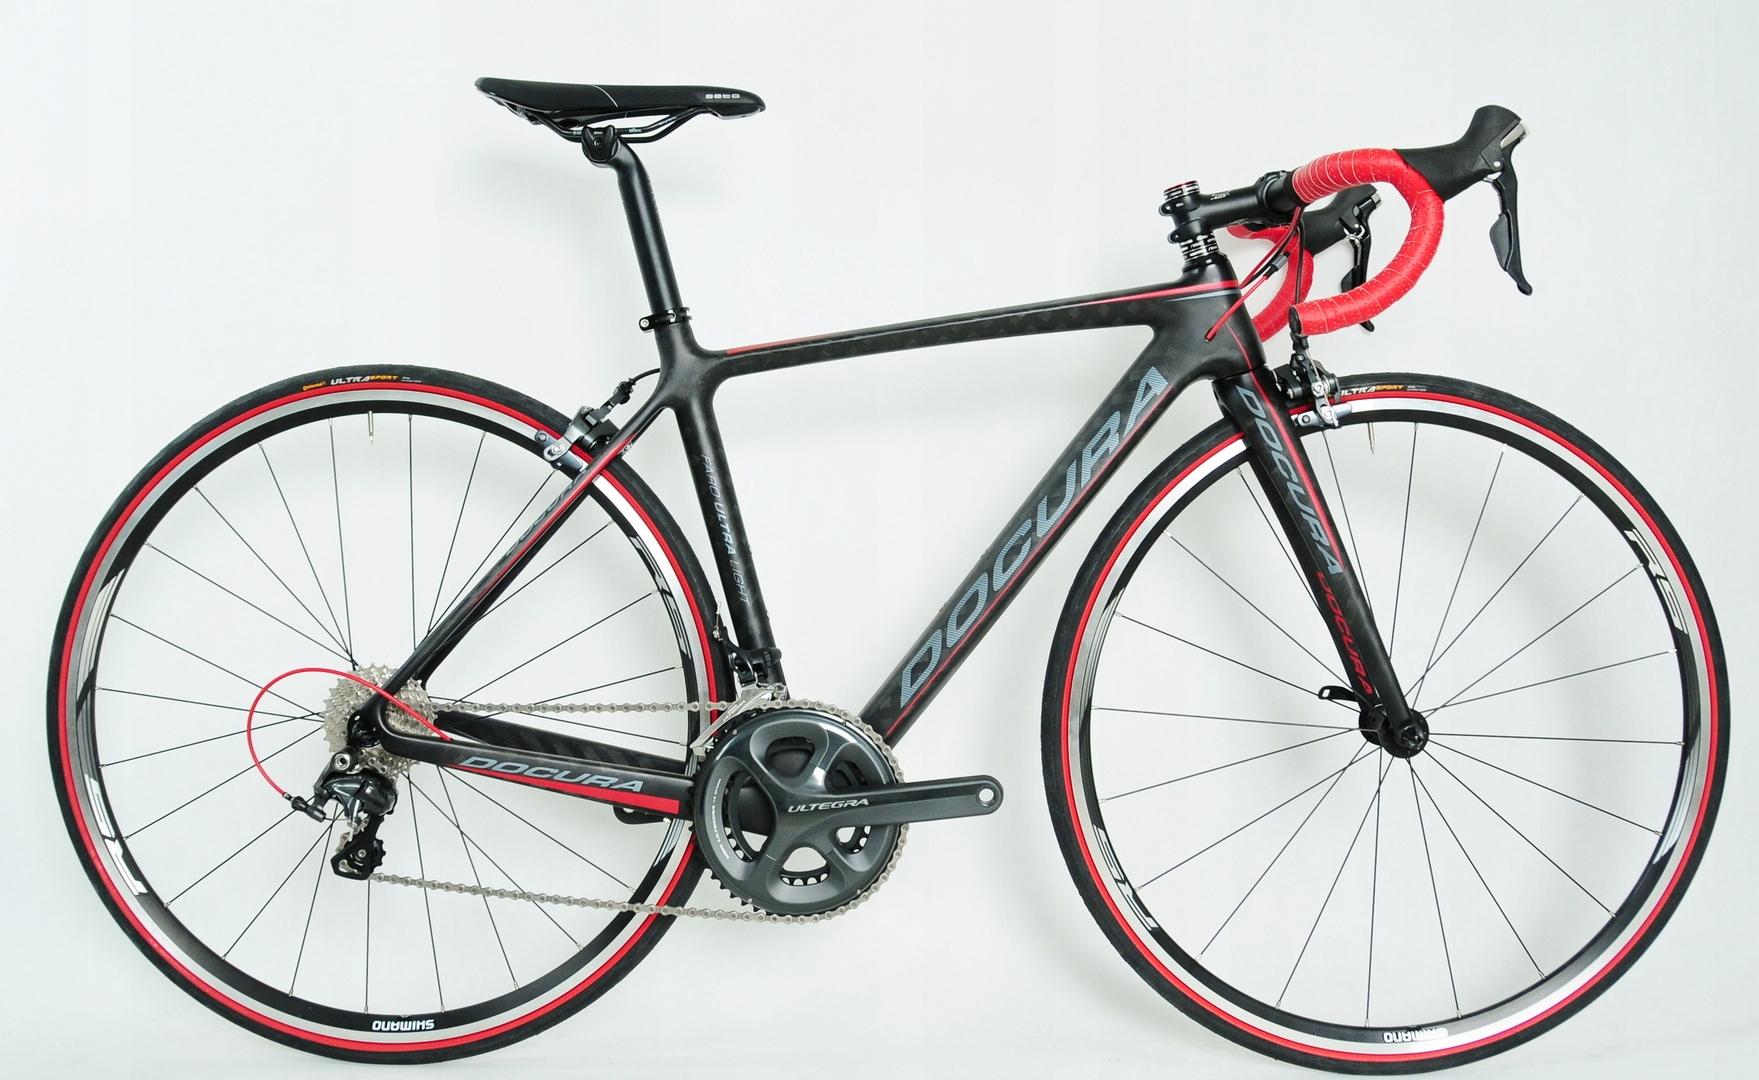 DOCURA FARO koleso Shimano ULTEGRA XS